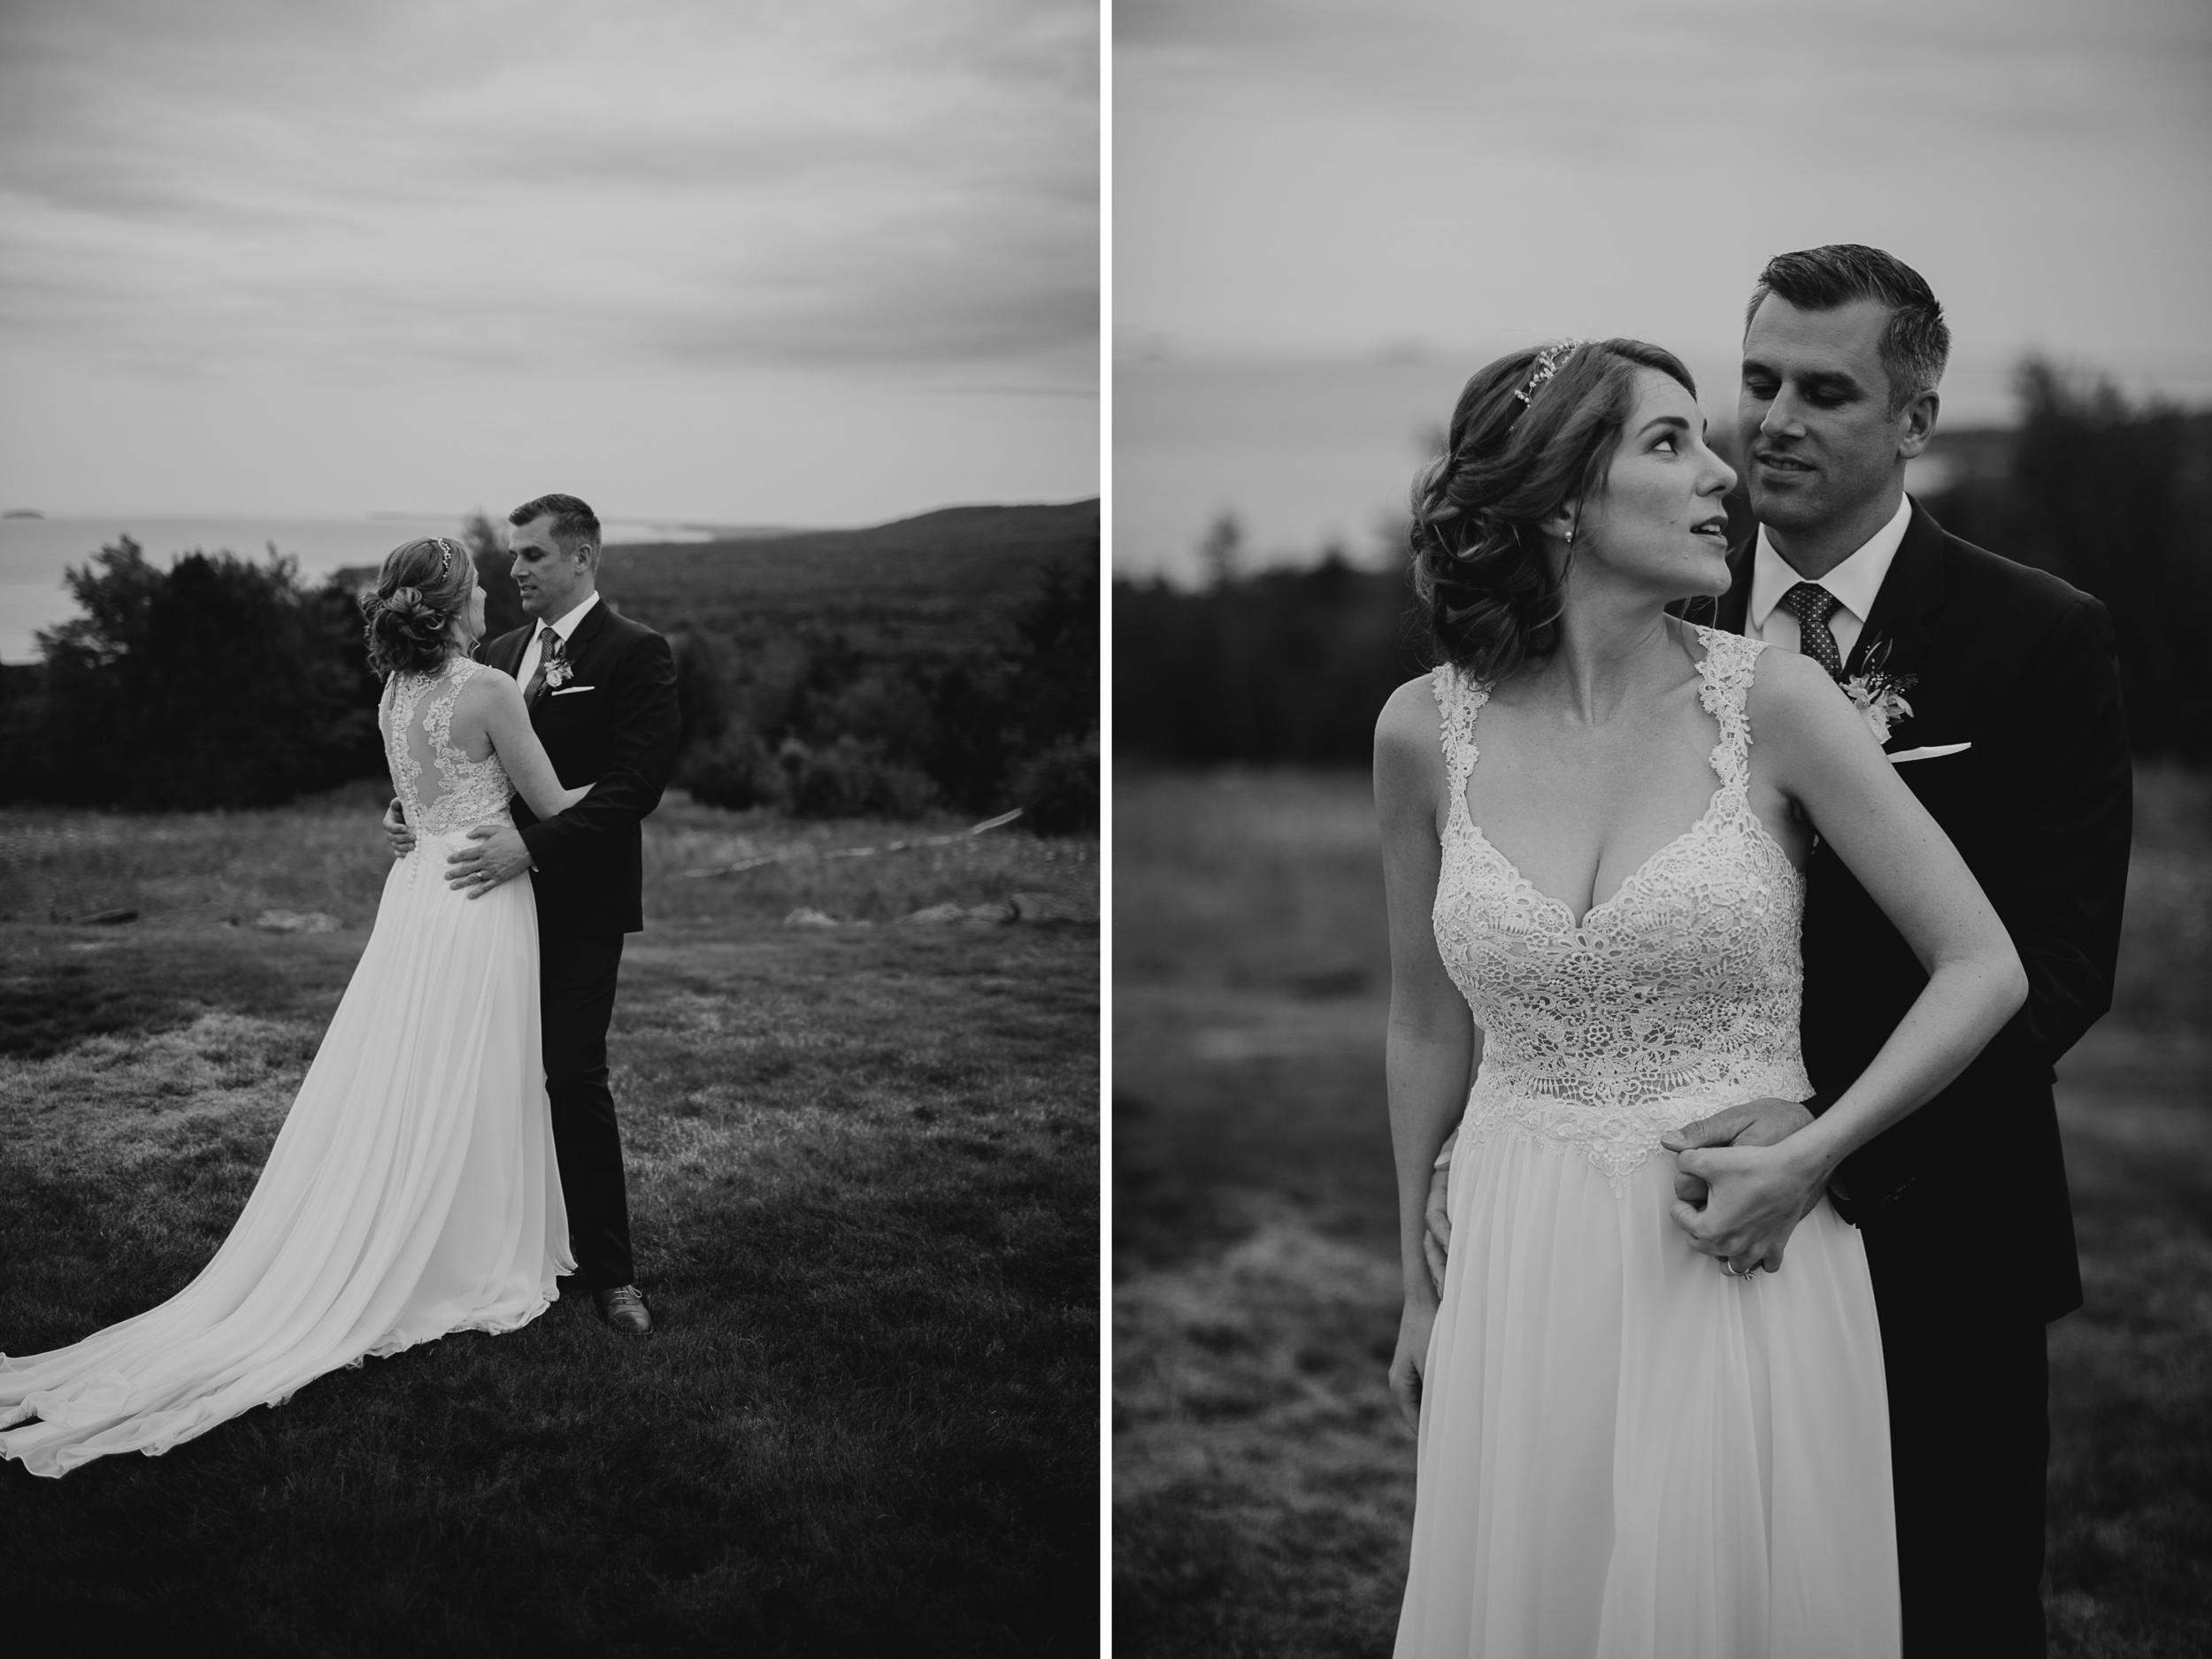 point_lookout_northport_Maine_Midcoast_wedding_leslie_justin-27.jpg